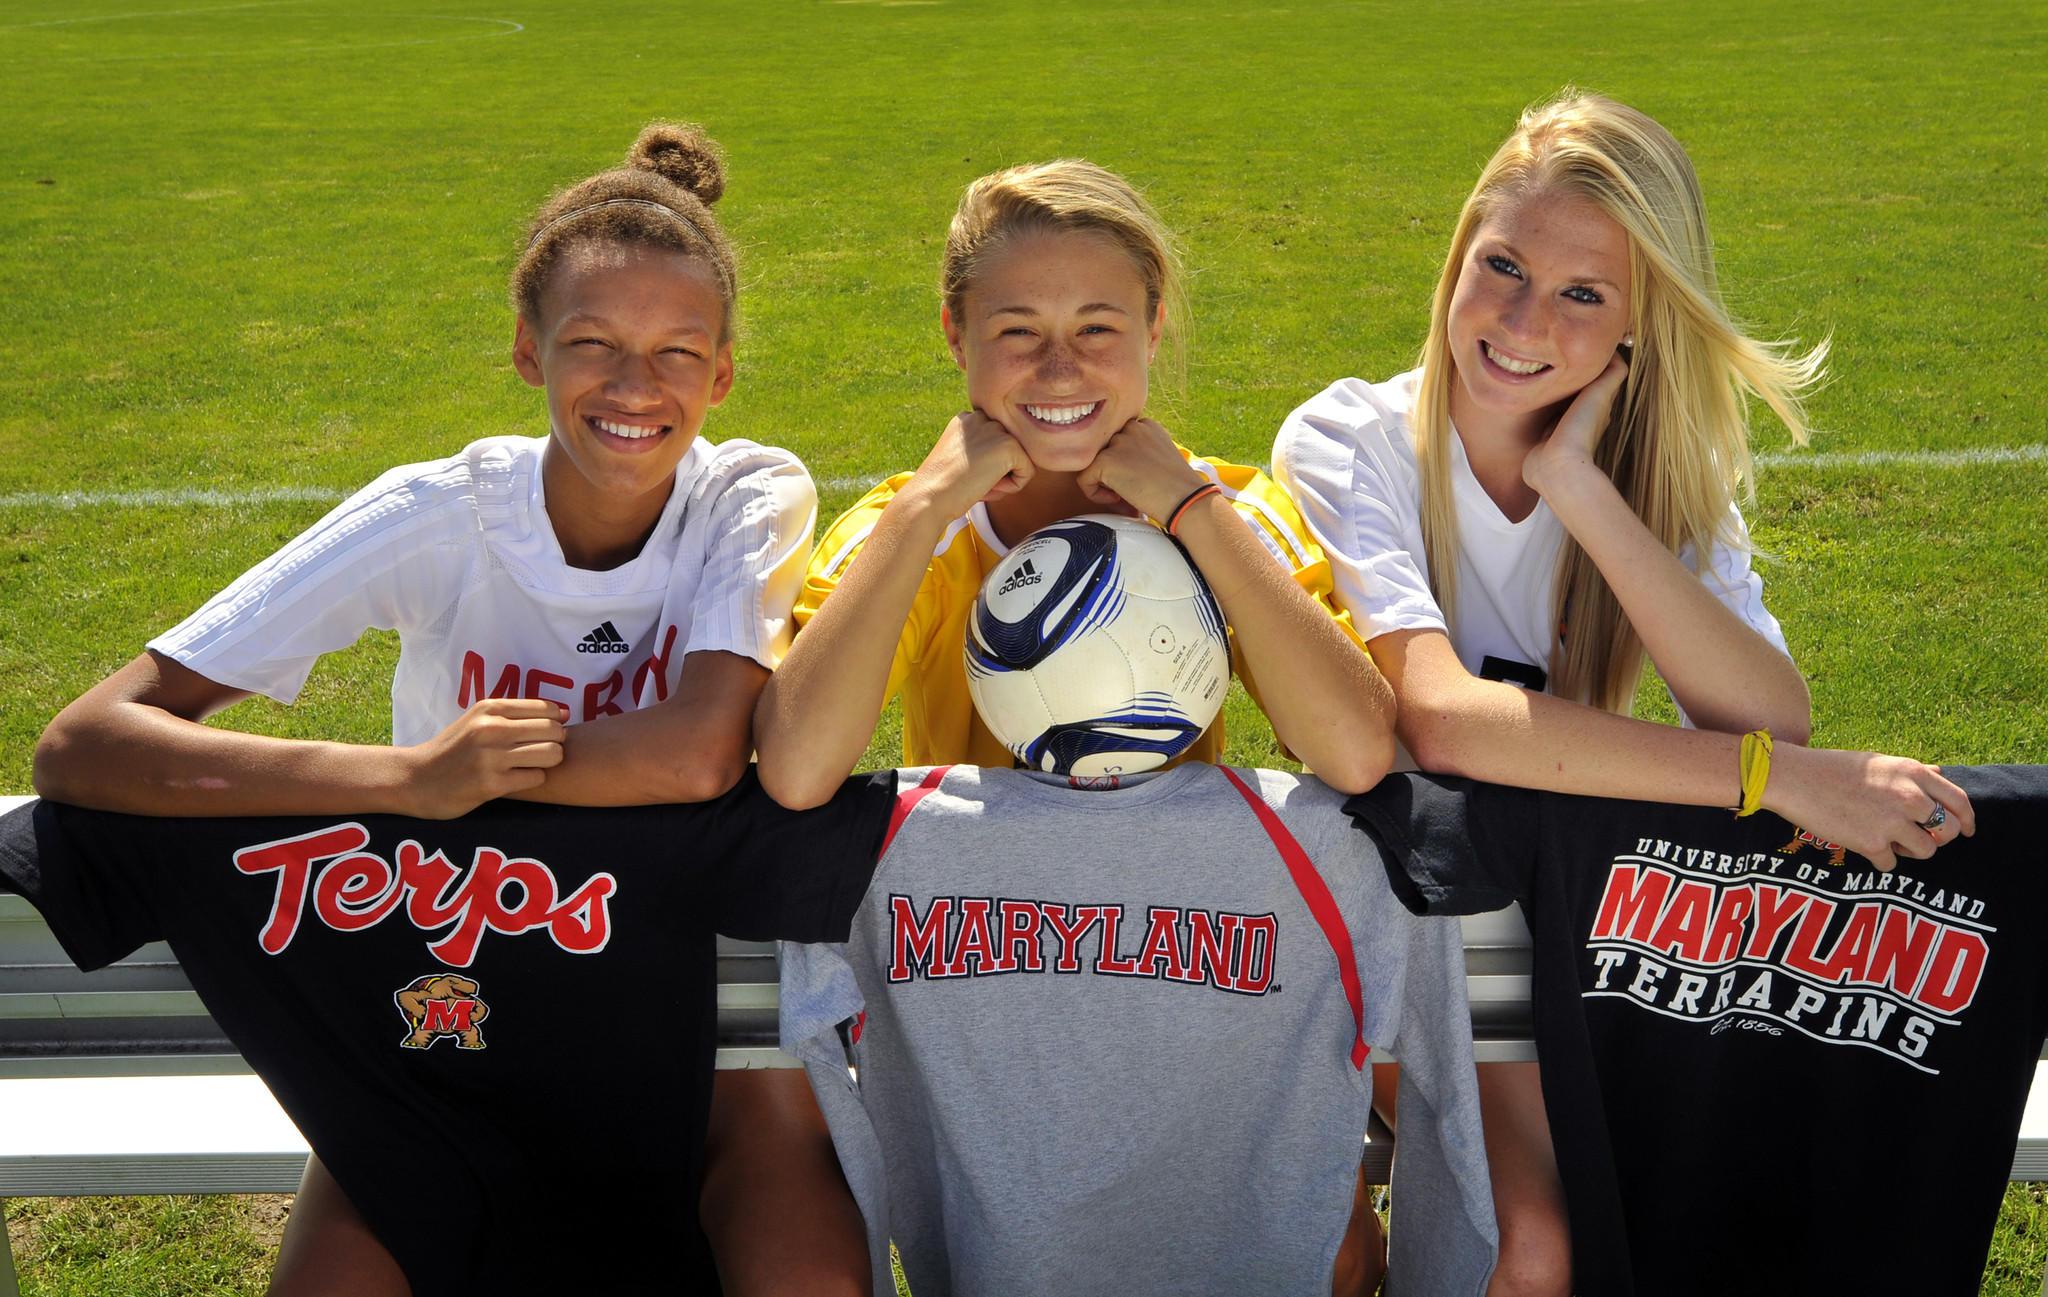 BLANCHE: Maryland Girls